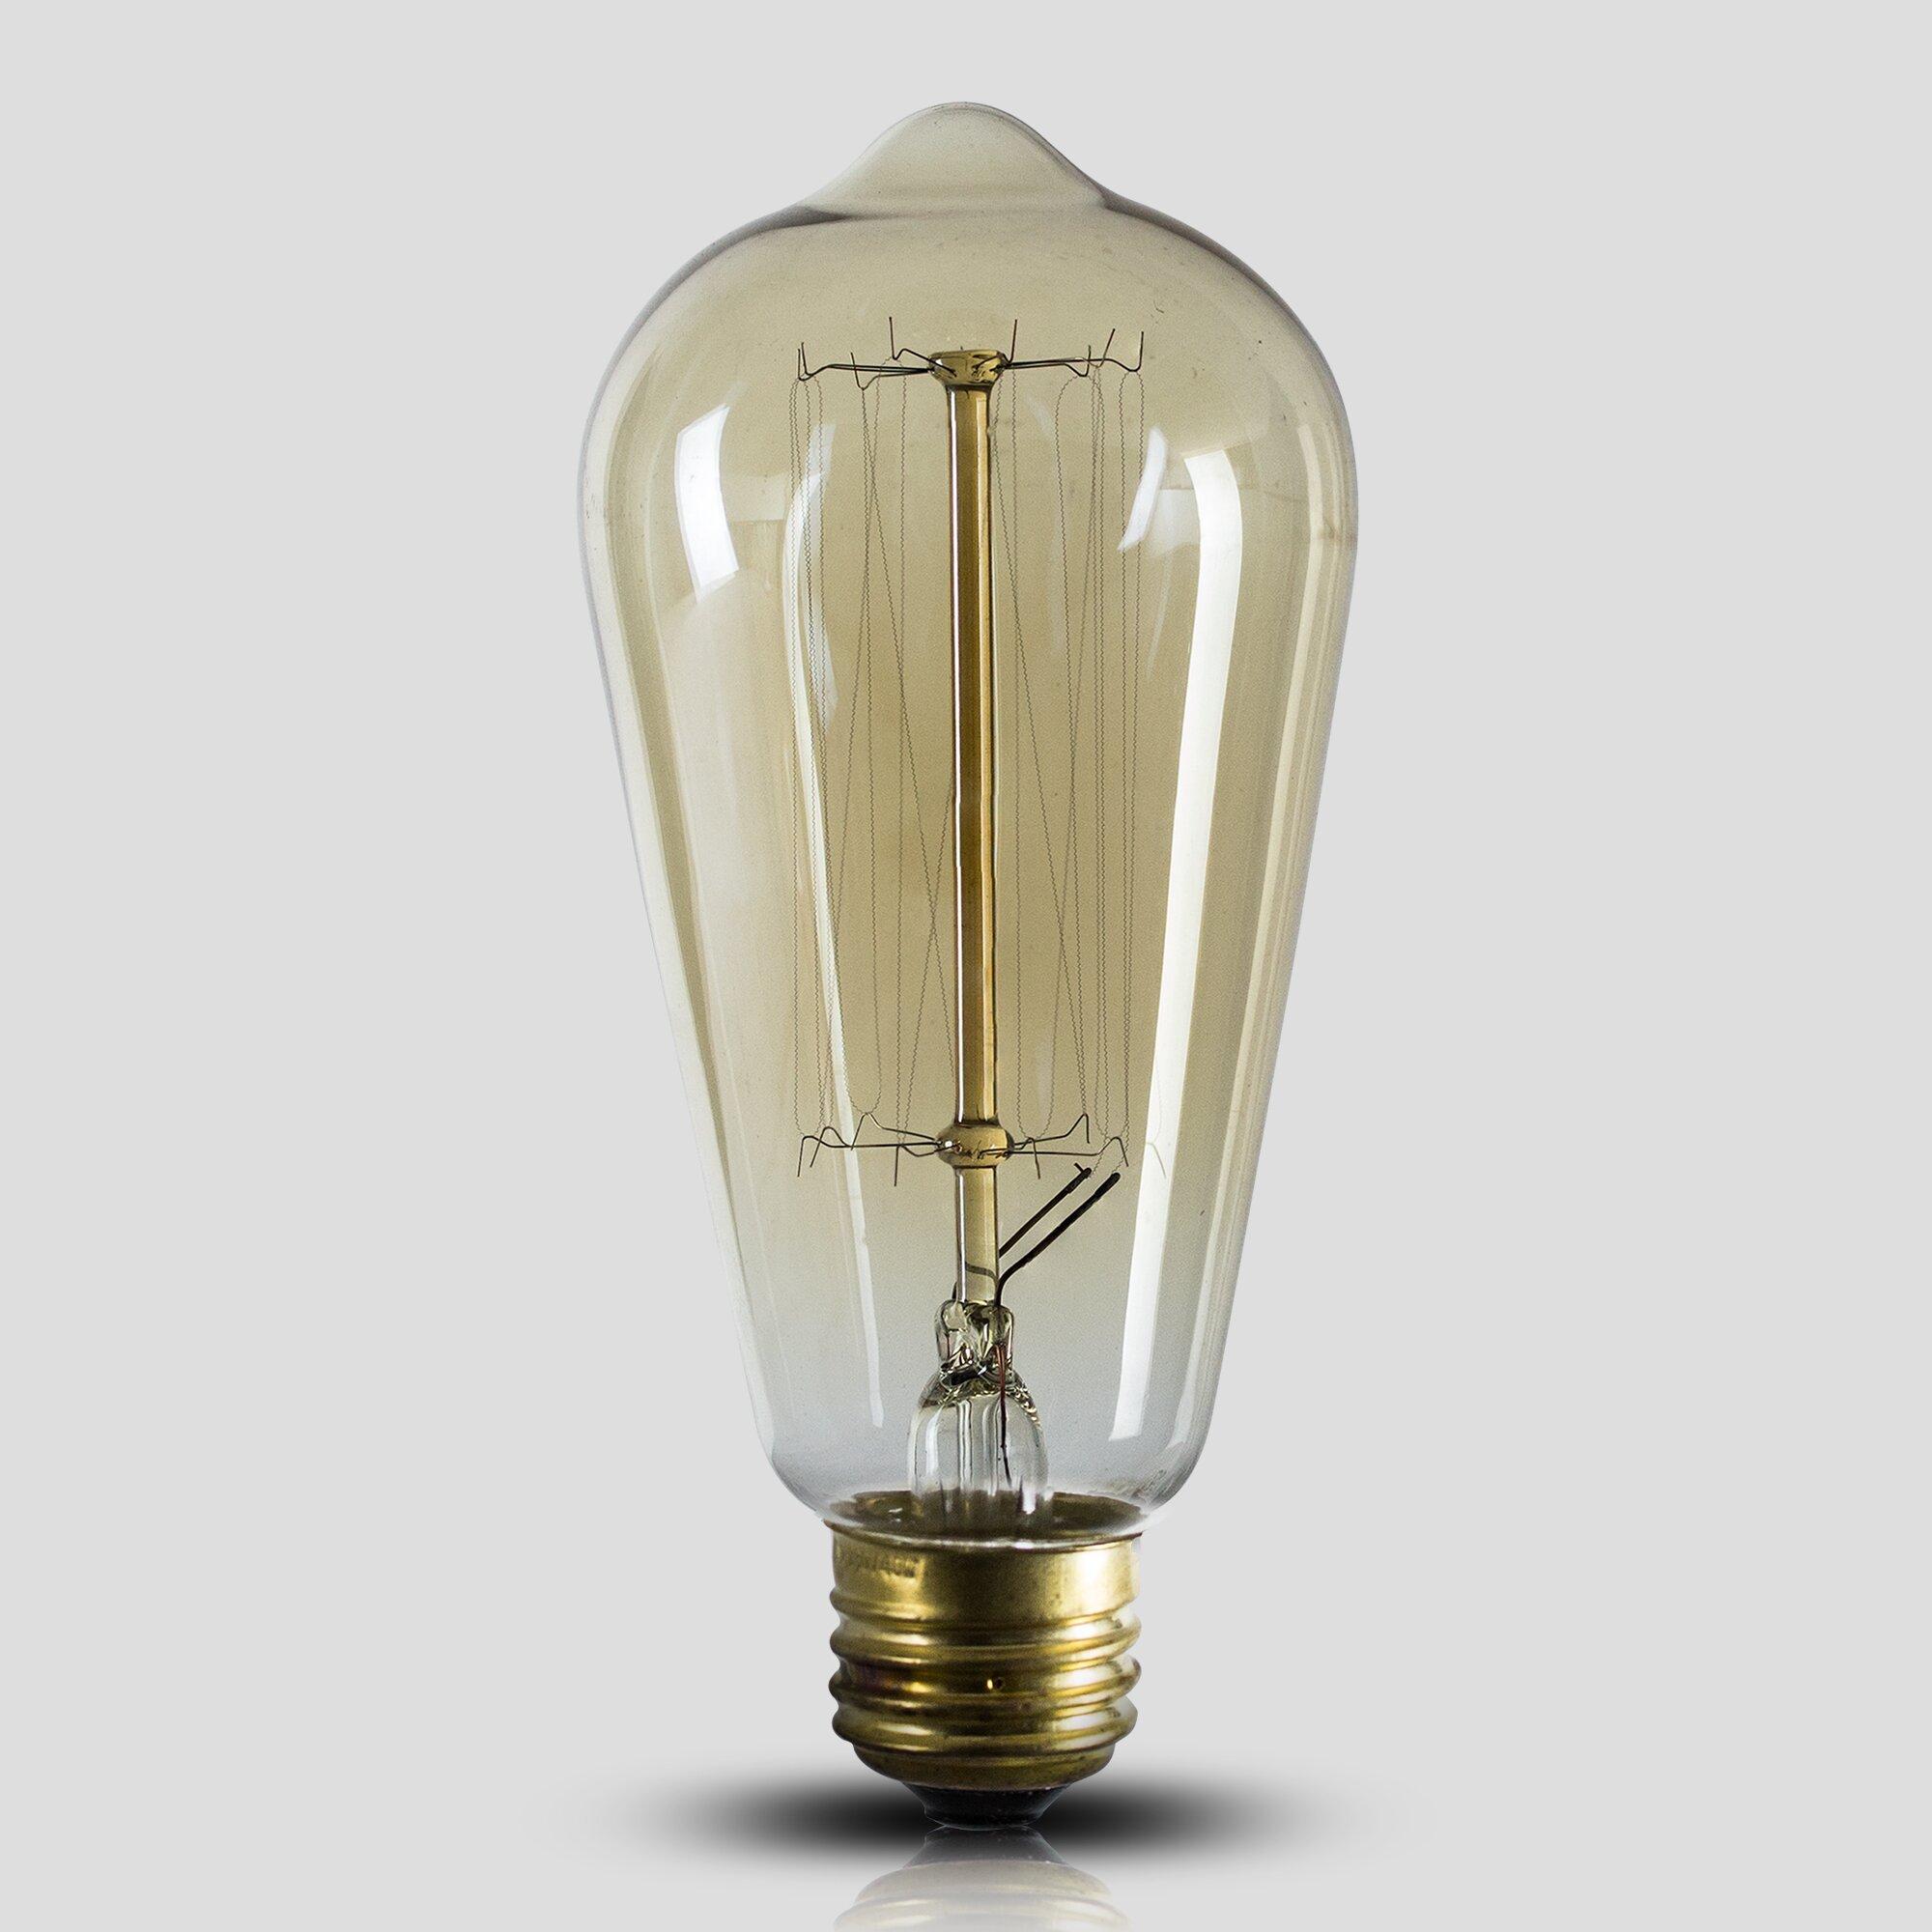 40w Vintage Retro Filament Edison Tungsten Light Bulb: CYRG Edison 40W Incandescent Vintage Filament Light Bulb